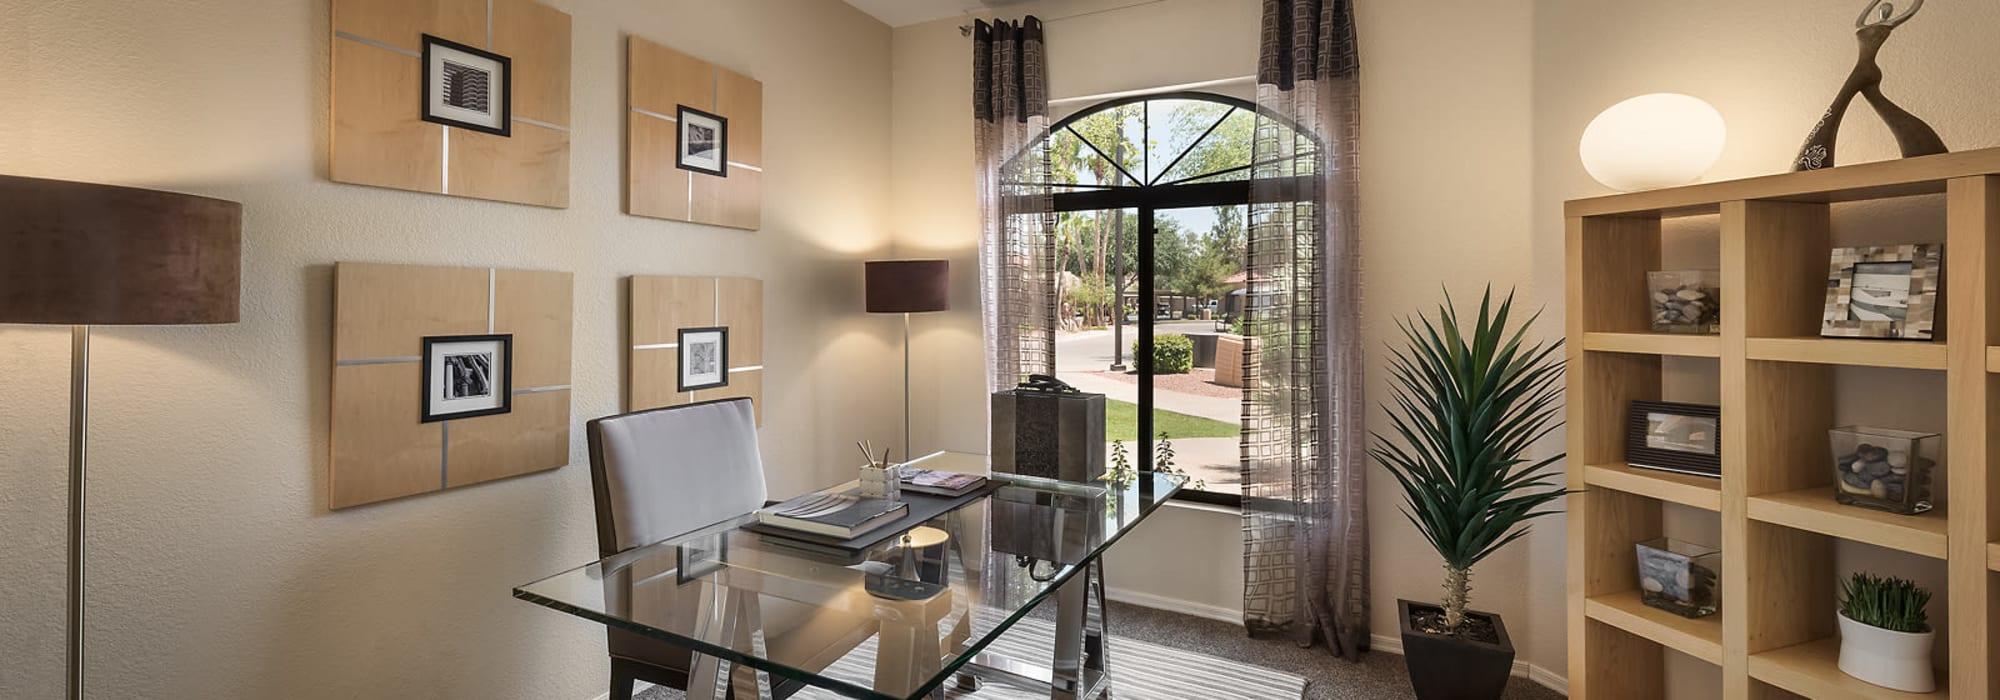 Luxury bedroom or office at San Cervantes in Chandler, Arizona